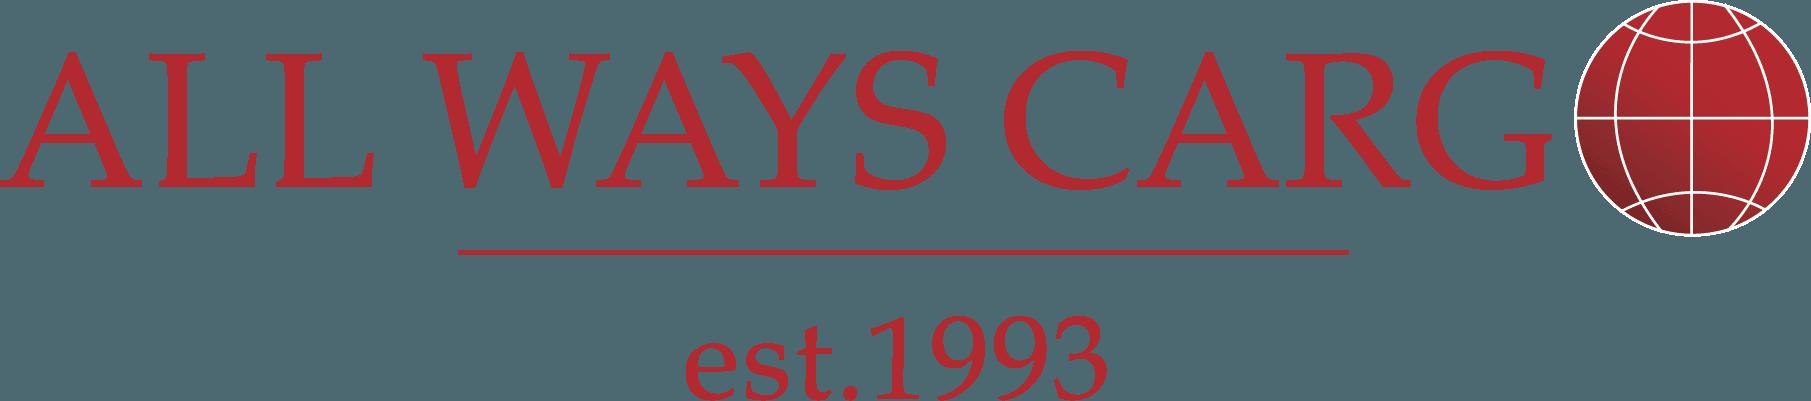 All Ways Cargo logo